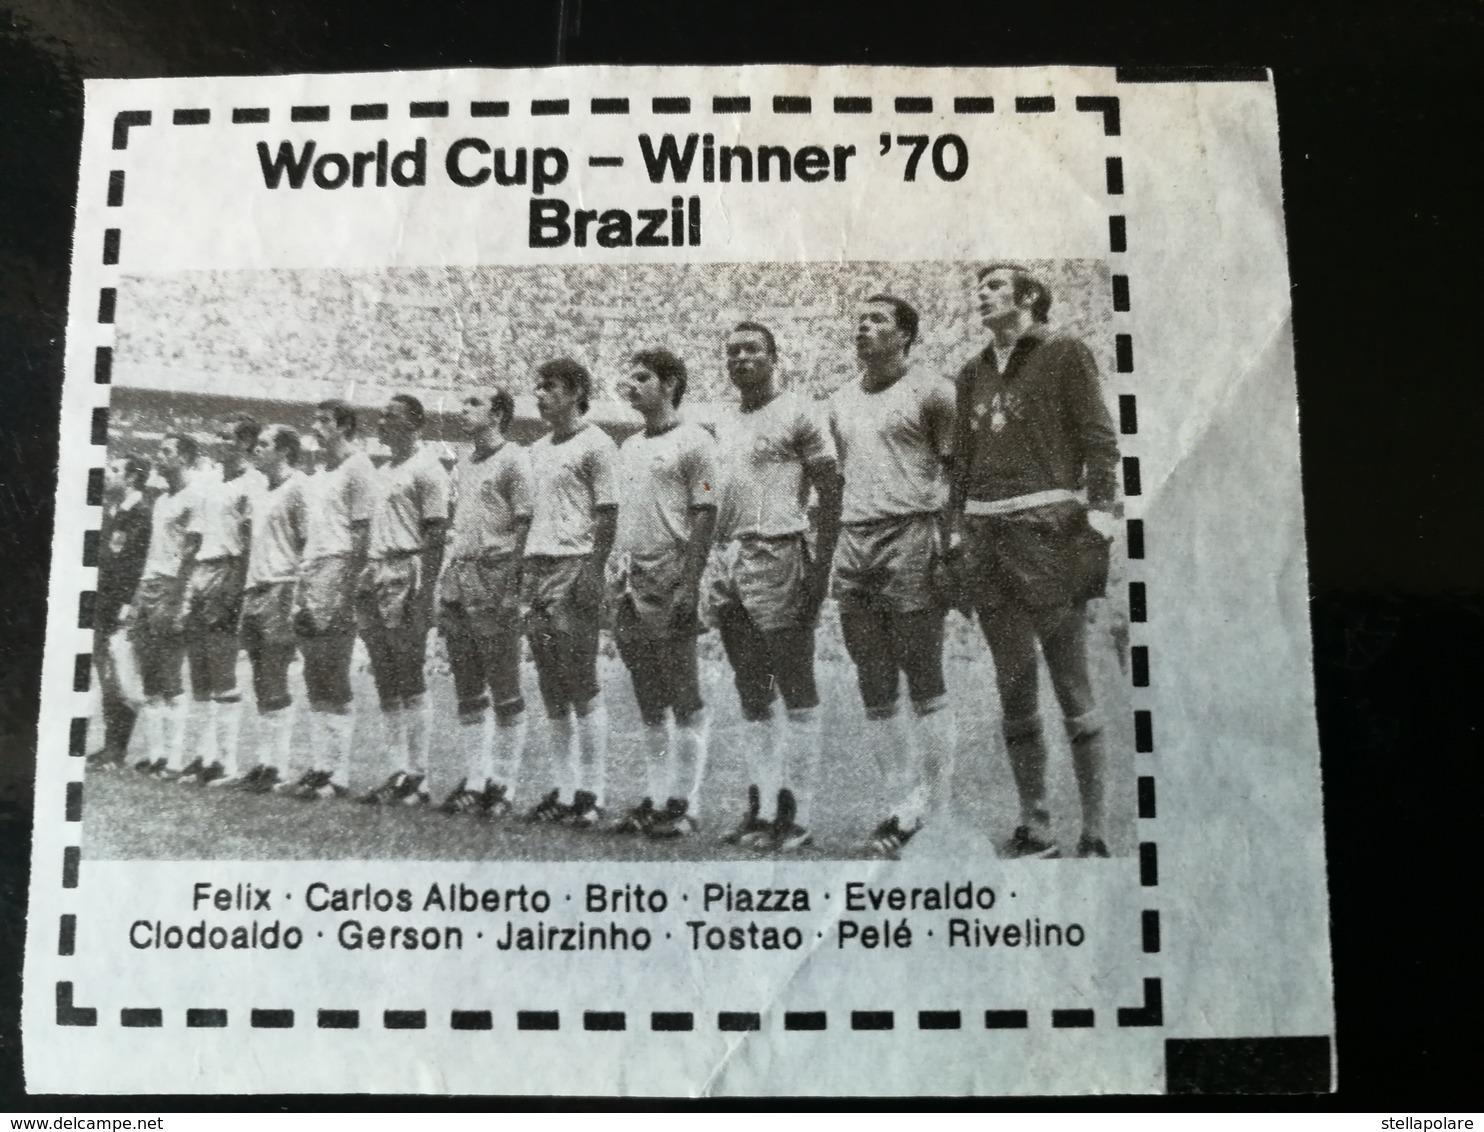 KAUGUMMI OK Bubbler World Cup Winner 1978 - BRASIL 1970 RIMET CUP WINNER - Süsswaren